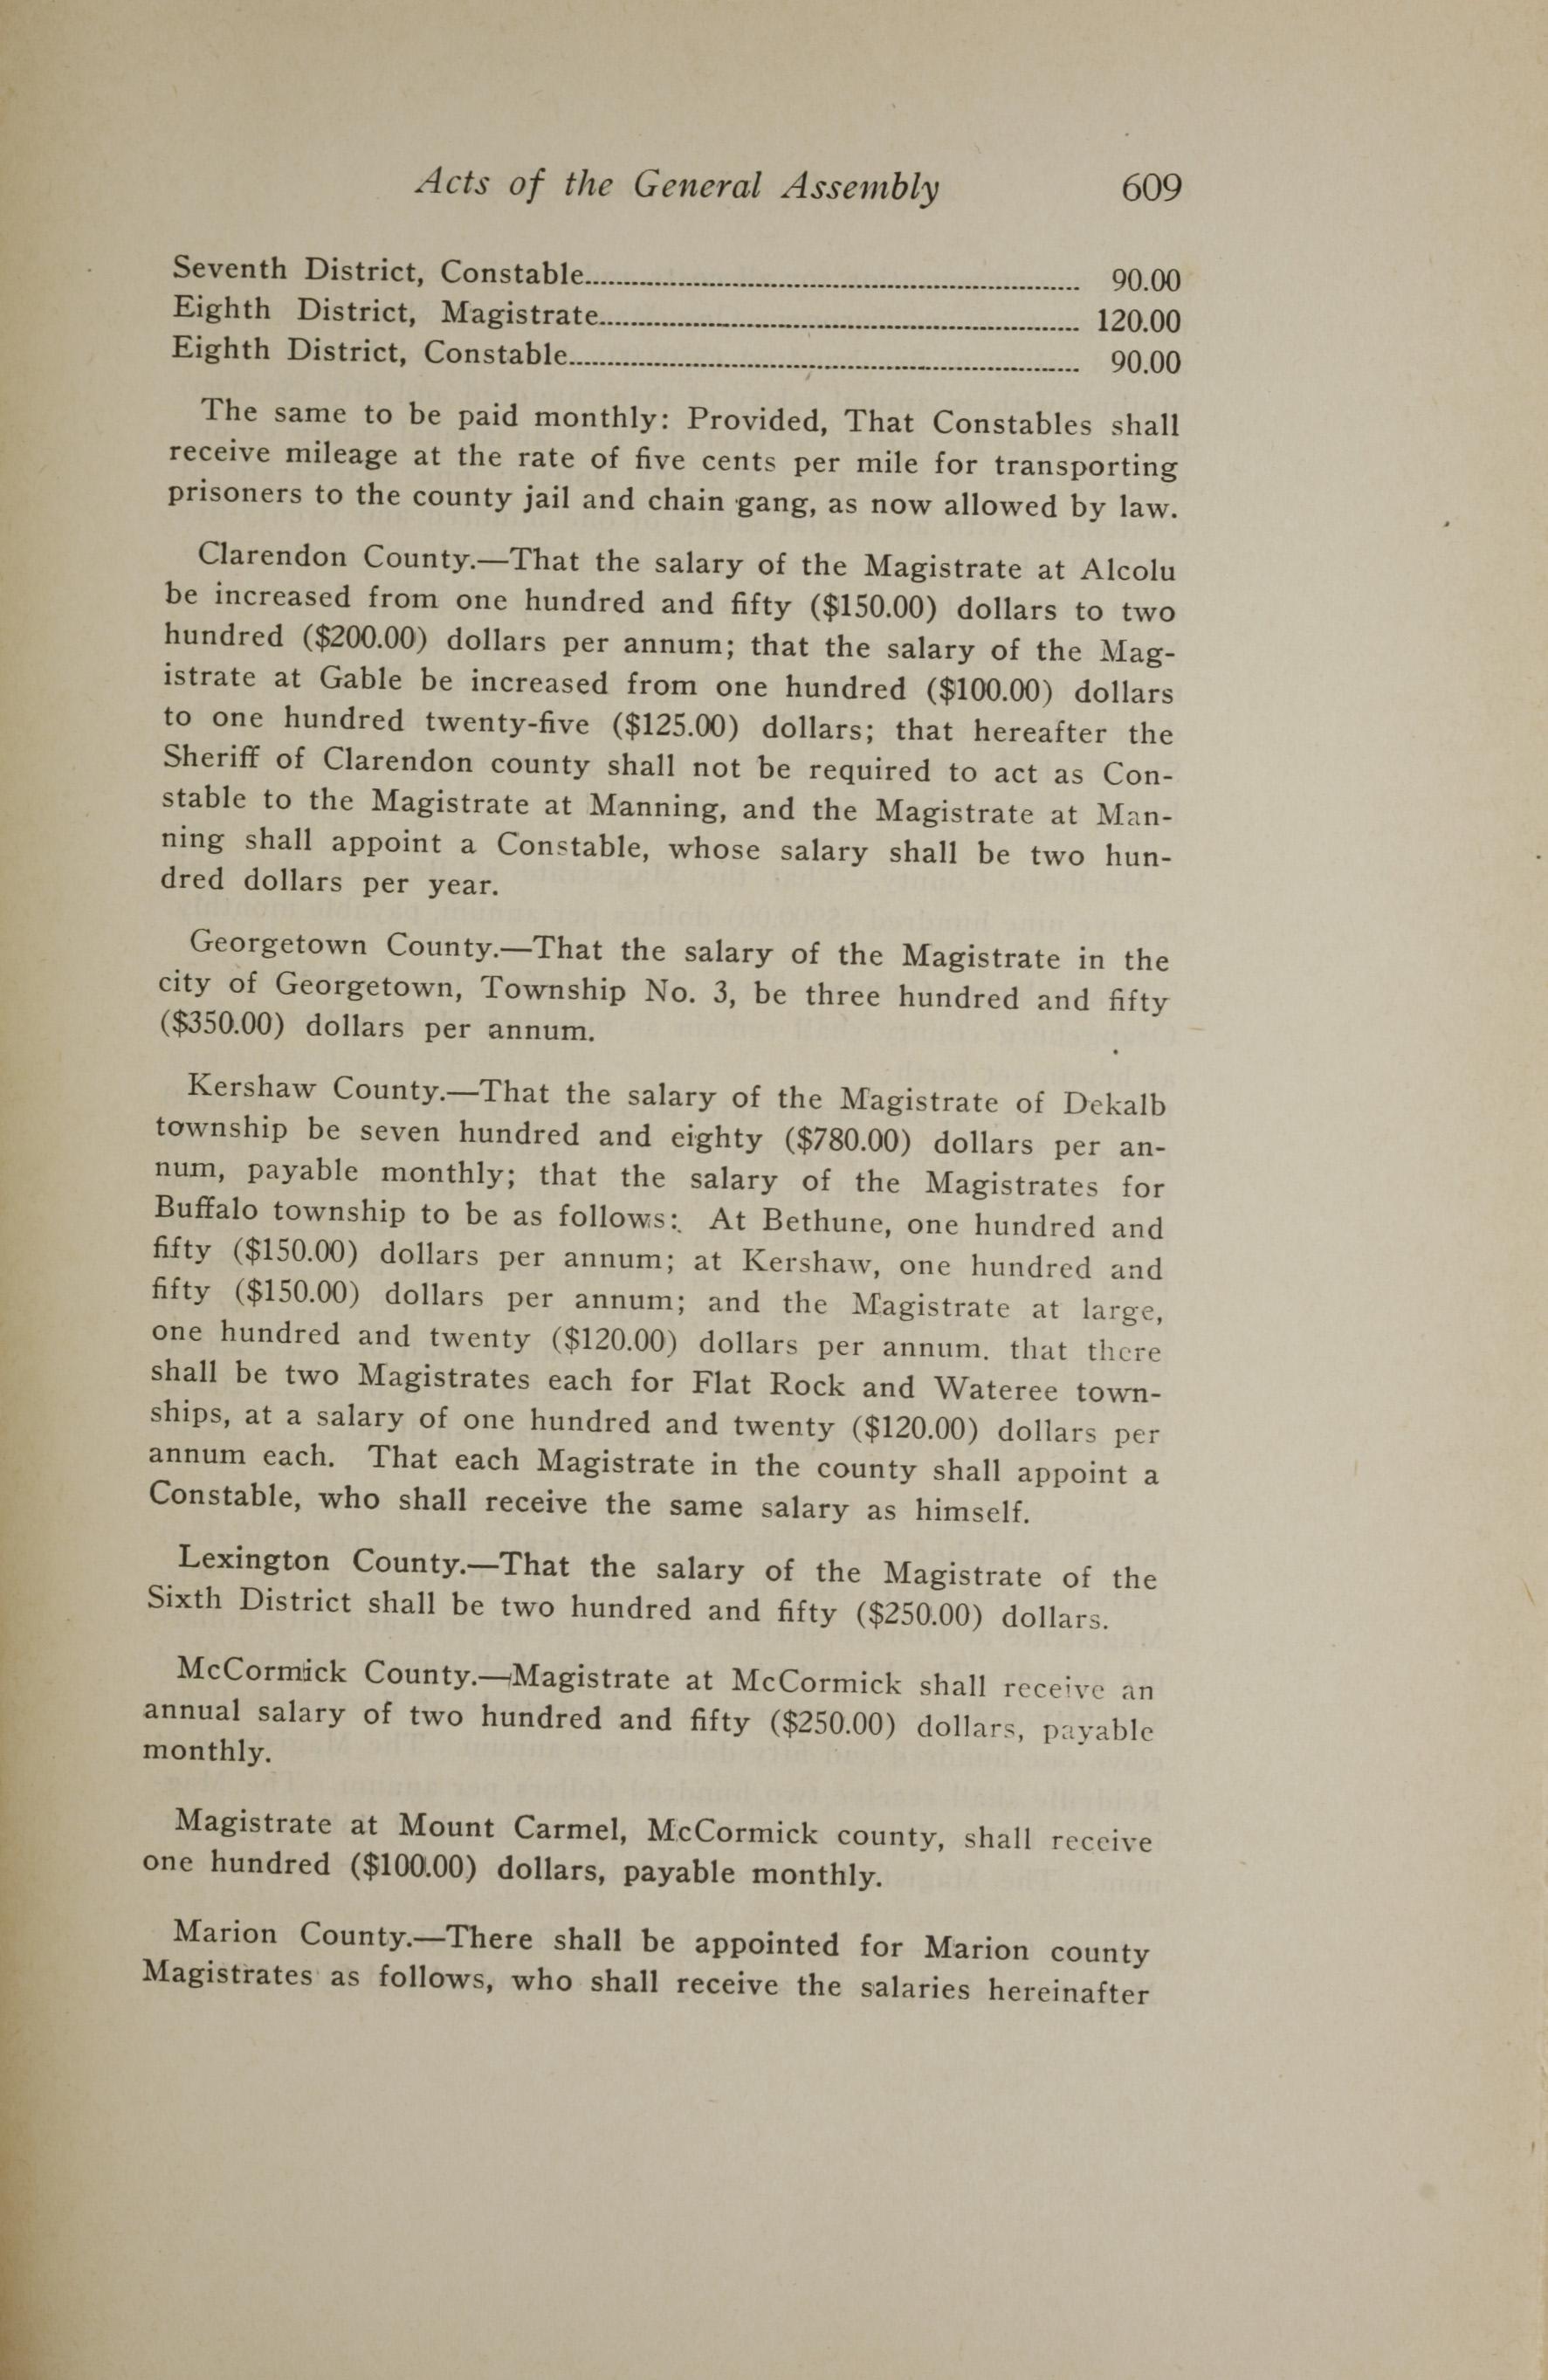 Charleston Yearbook, 1919, page 609